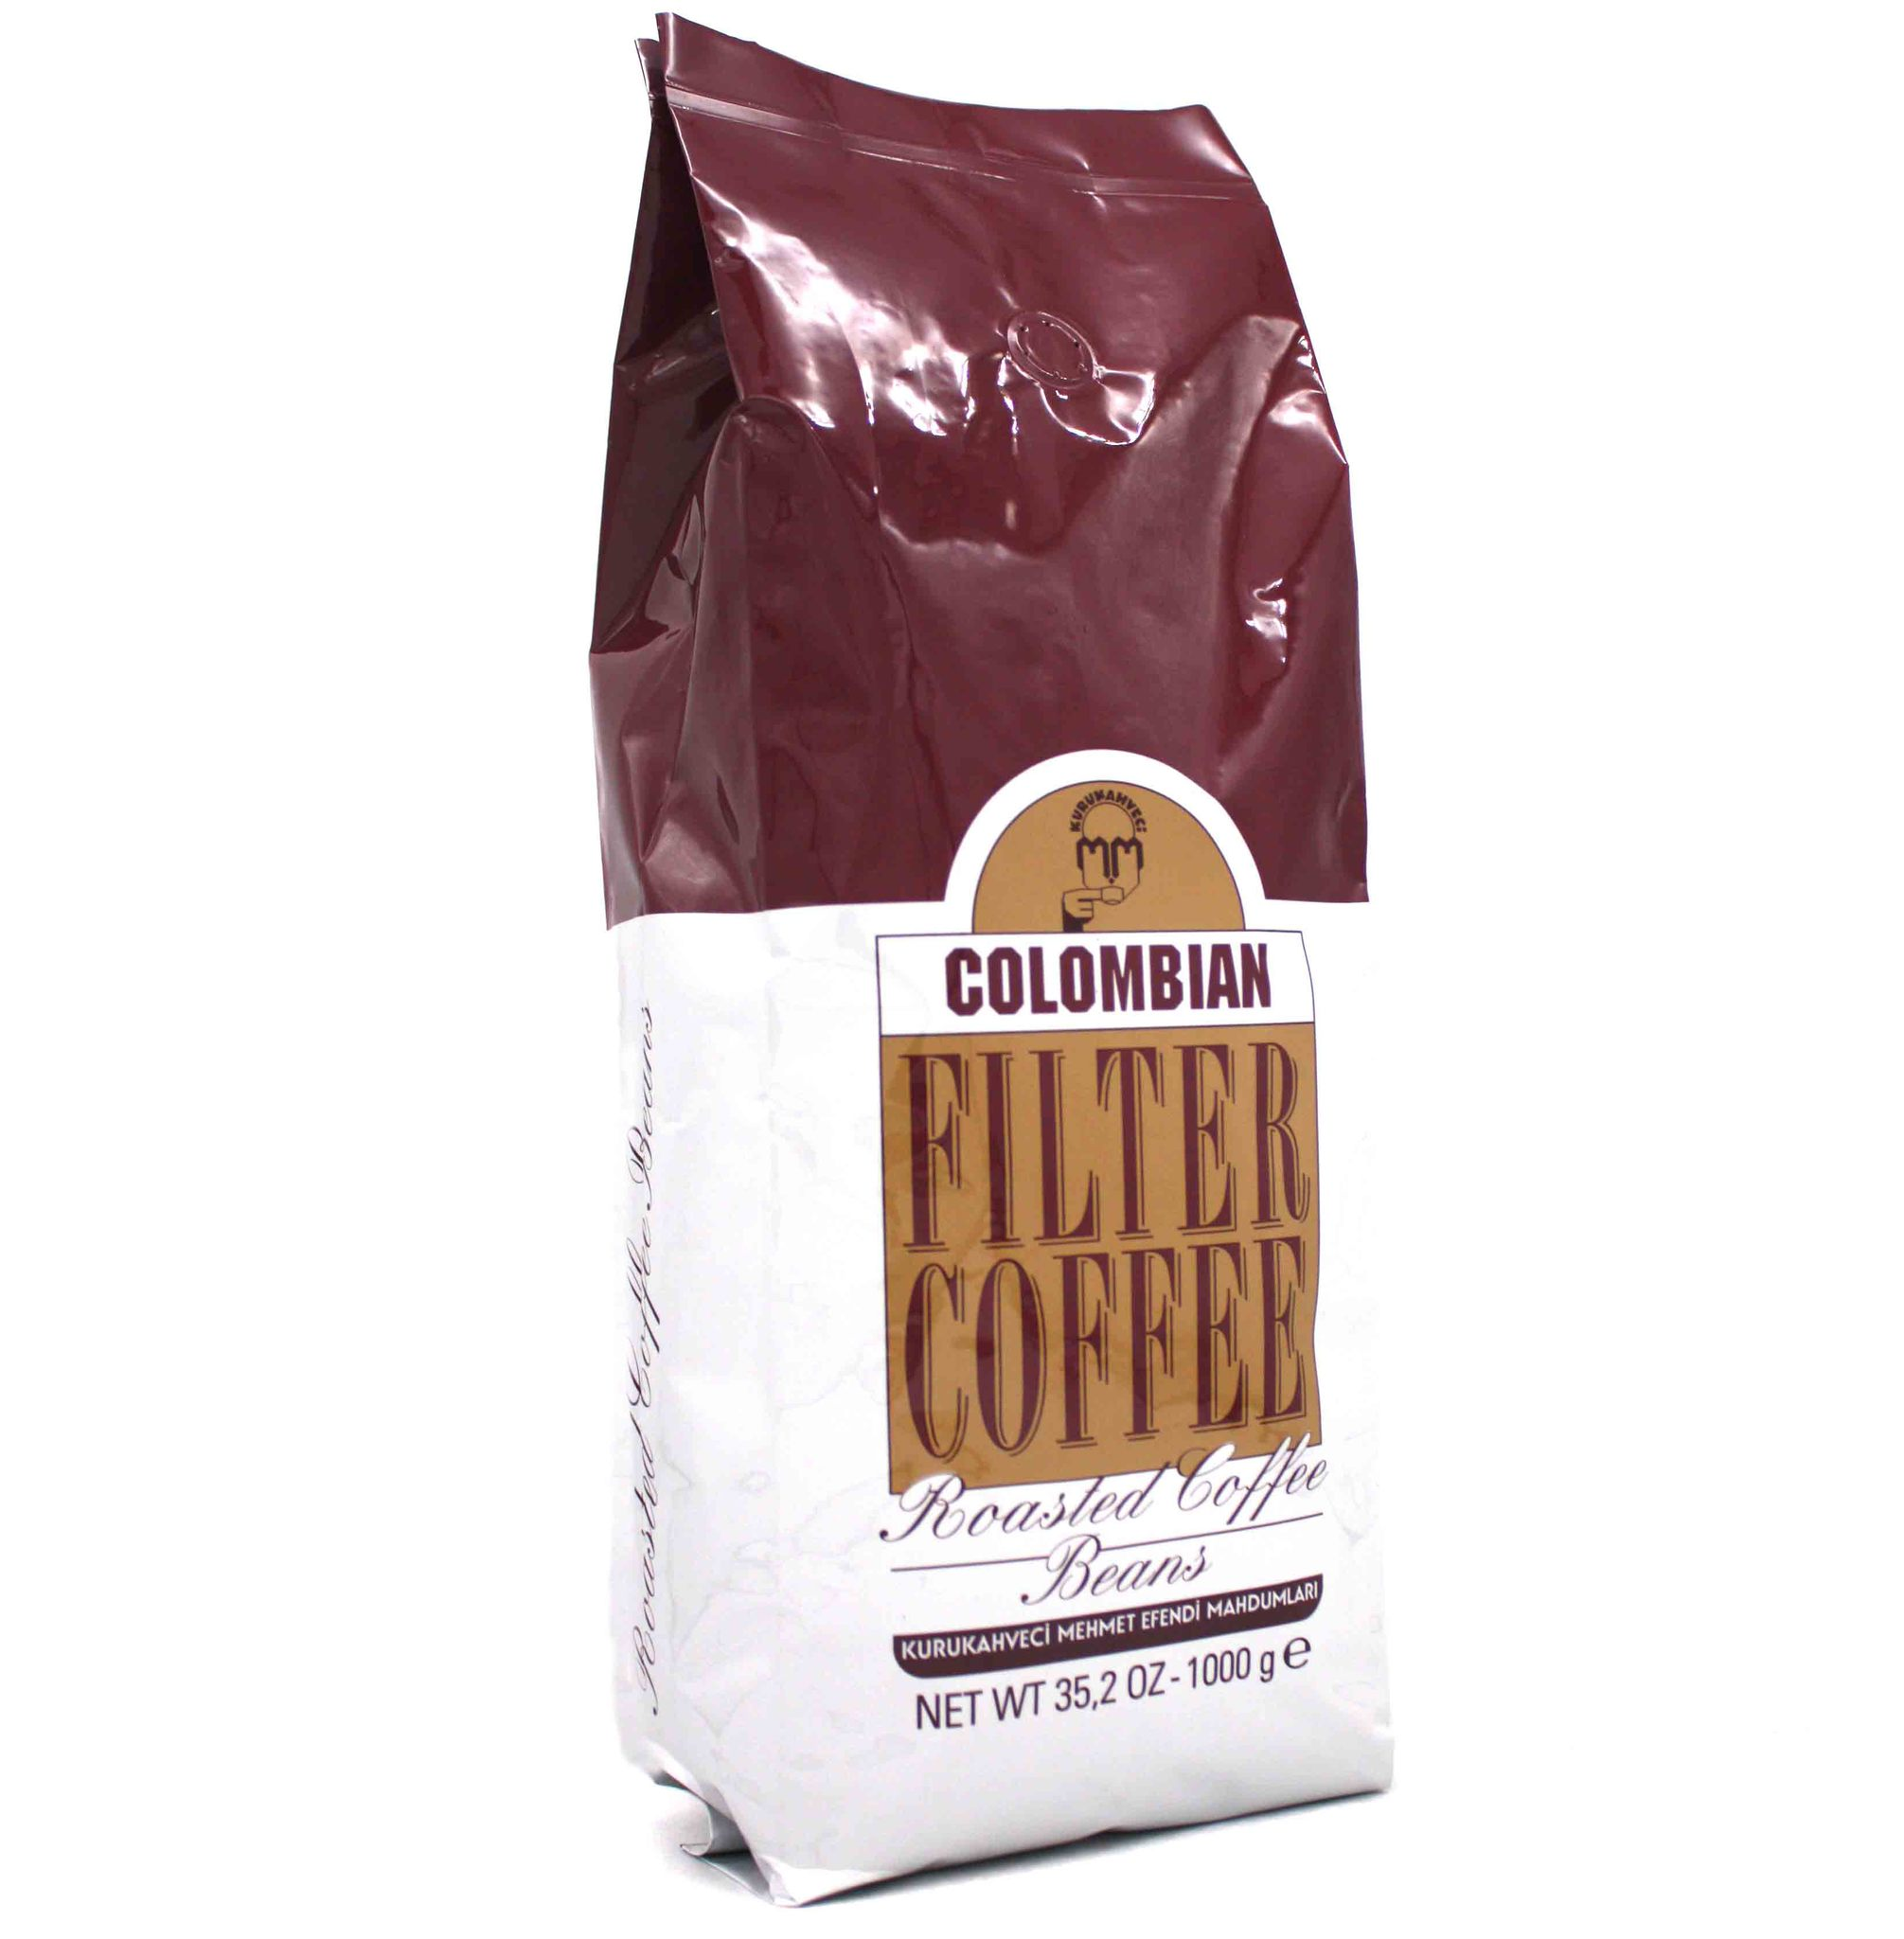 Mehmet Efendi Кофе в зернах Colombian, Mehmet Efendi, 1 кг import_files_02_021915f9bd9311e9a9b1484d7ecee297_ca1bb5a47afc11eaa9c8484d7ecee297.jpg